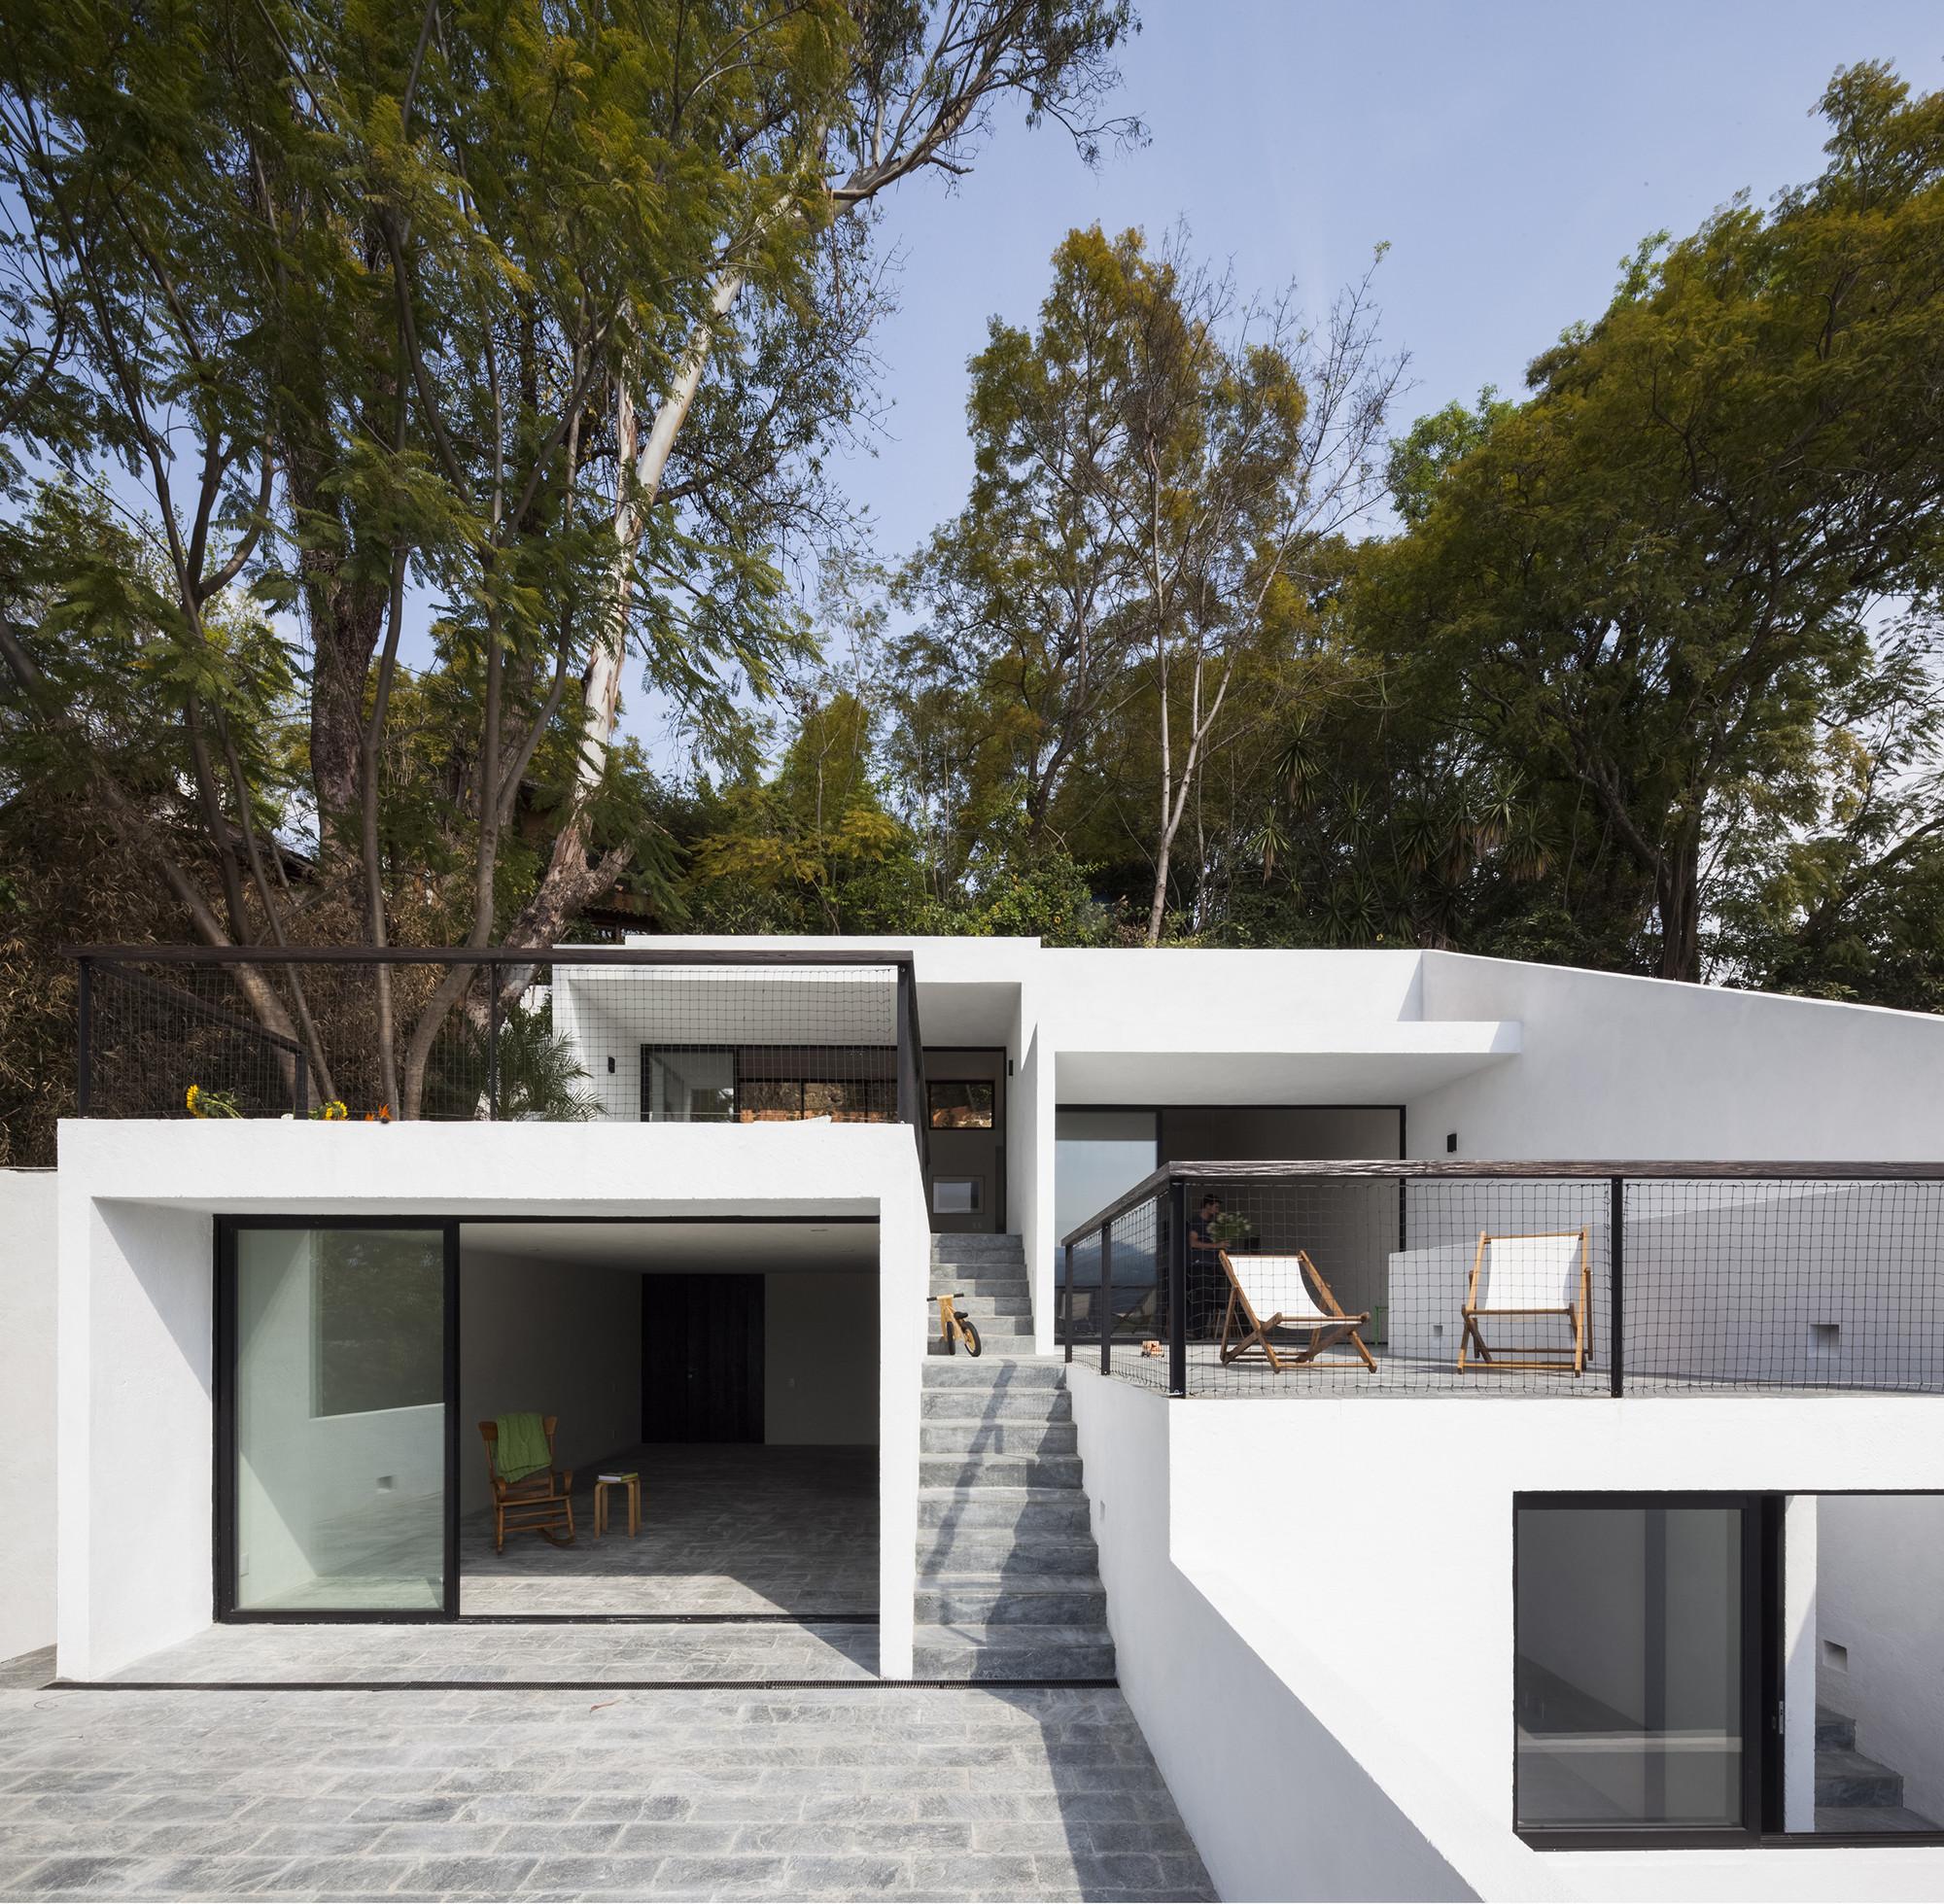 House of Stairs / Dellekamp Arquitectos, © Sandra Pereznieto